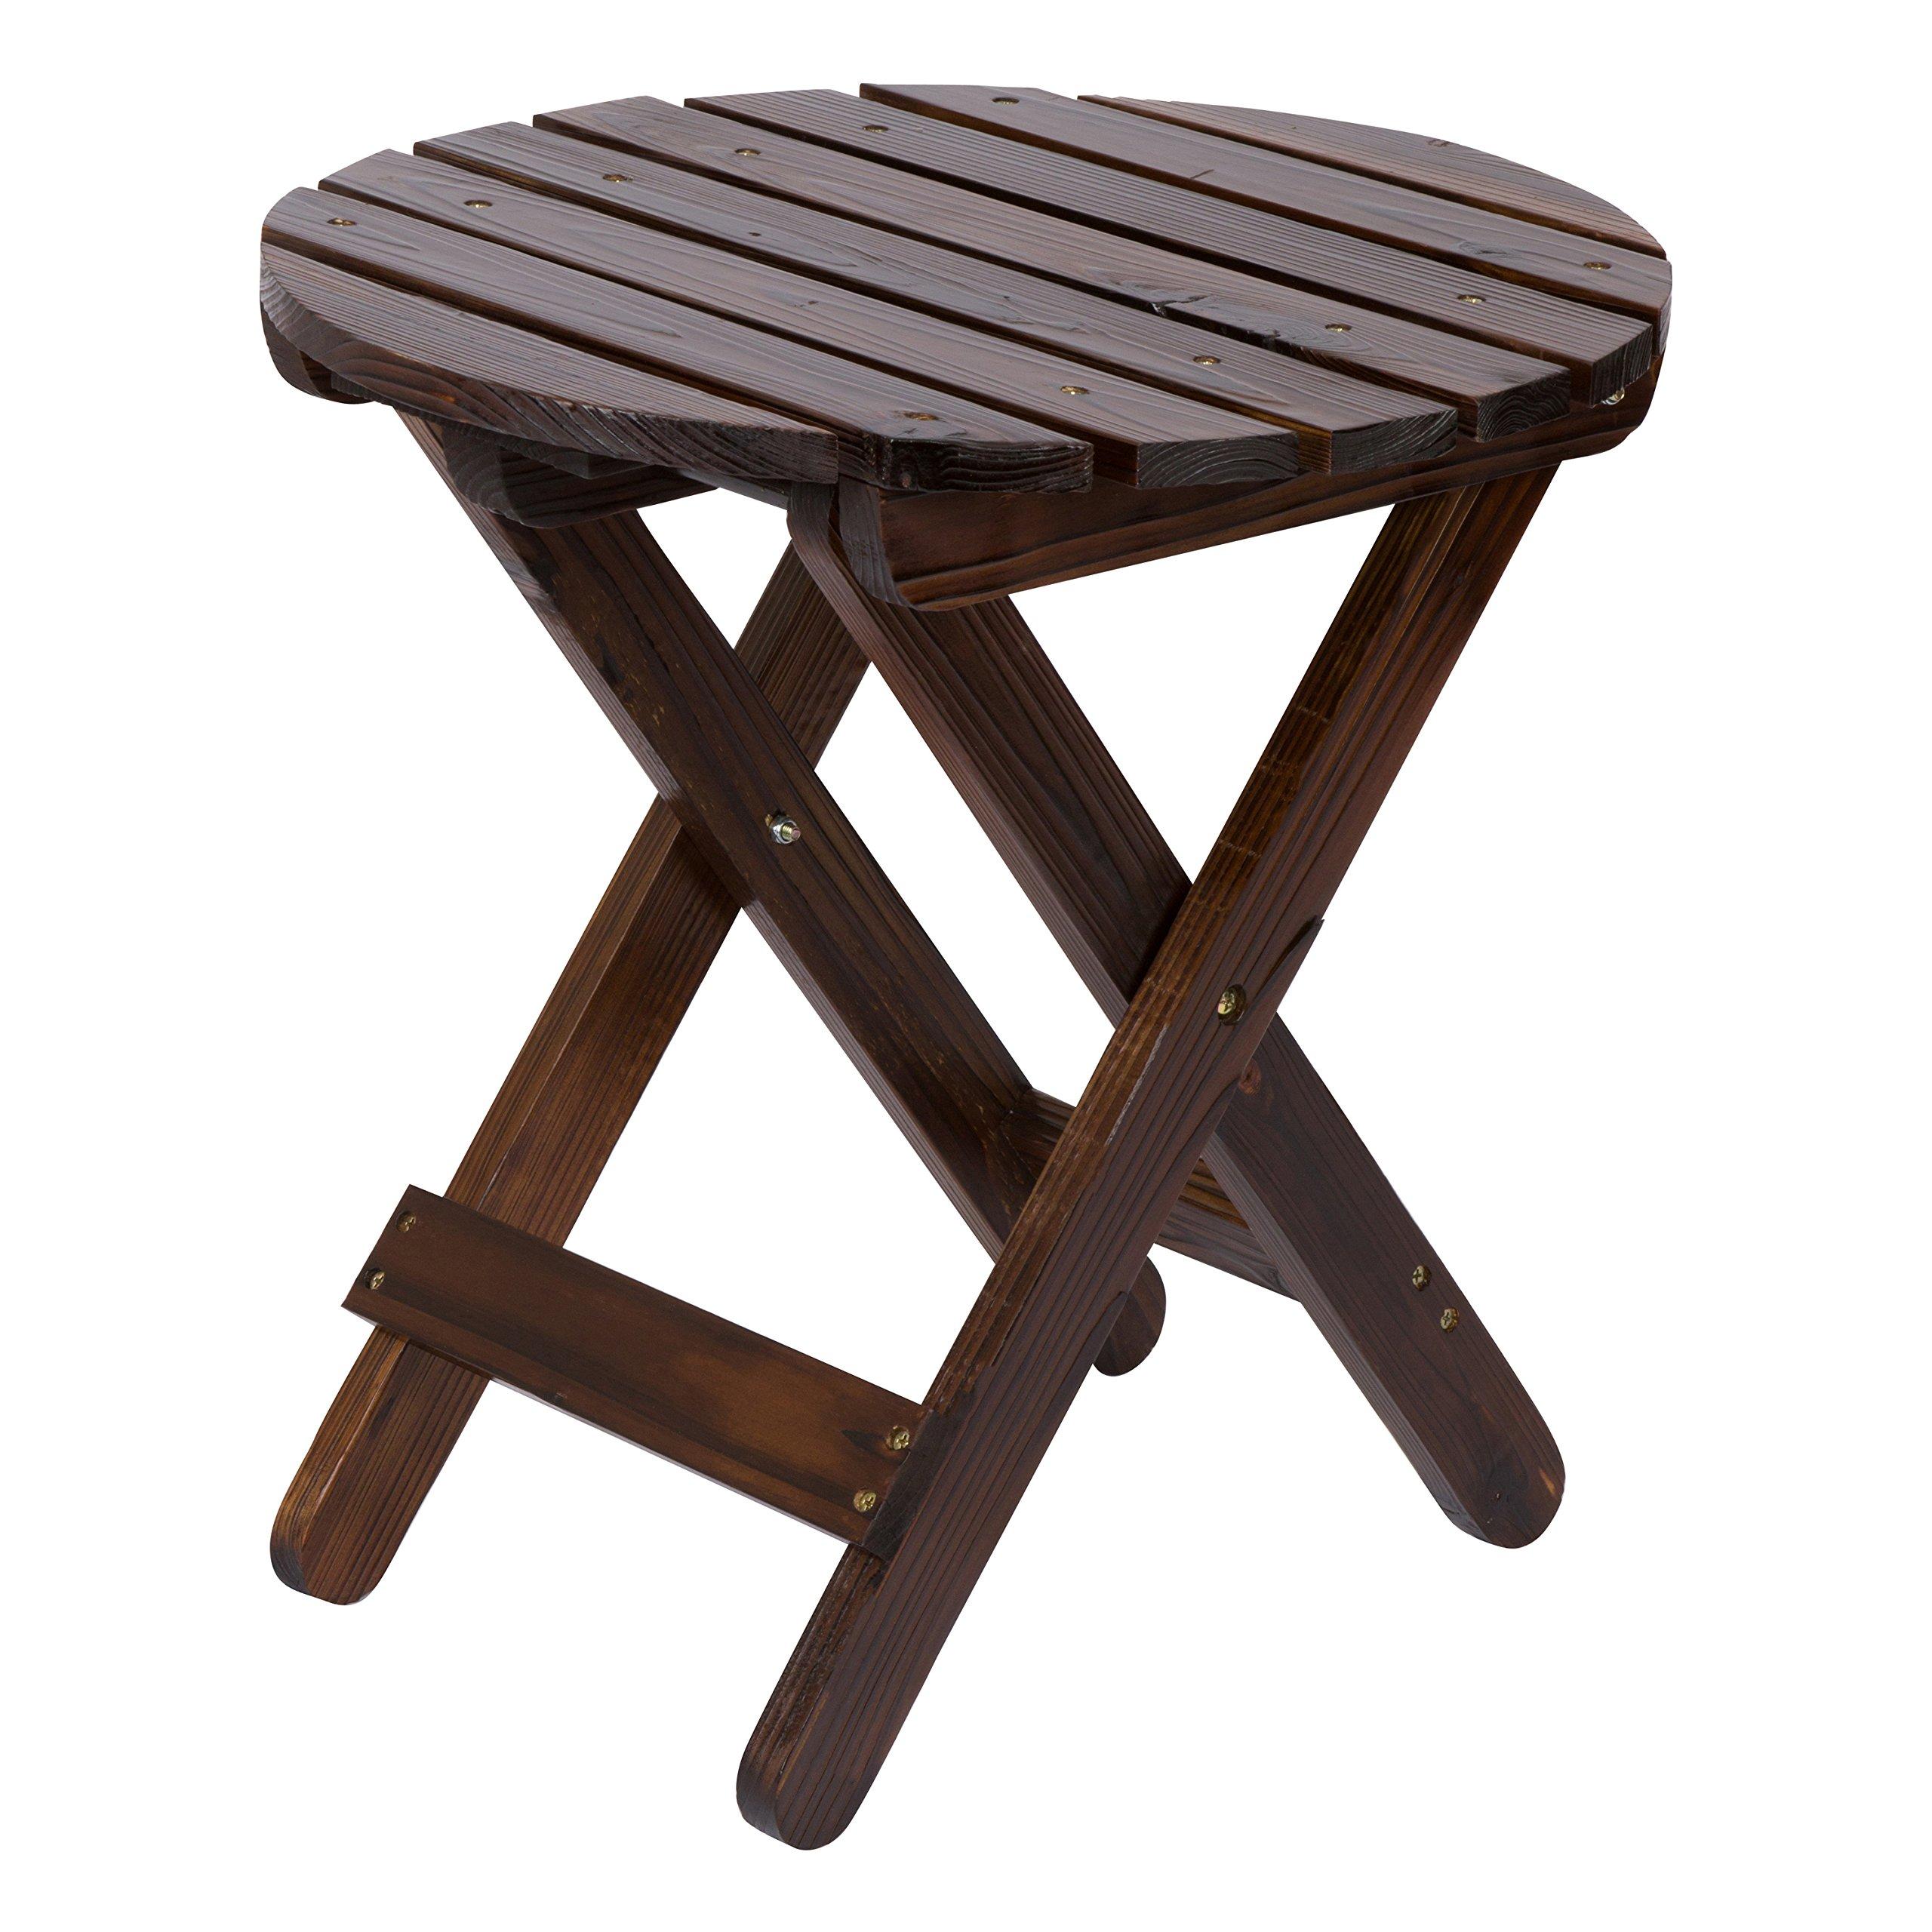 Shine Company Adirondack Round Folding Table, Burnt Brown